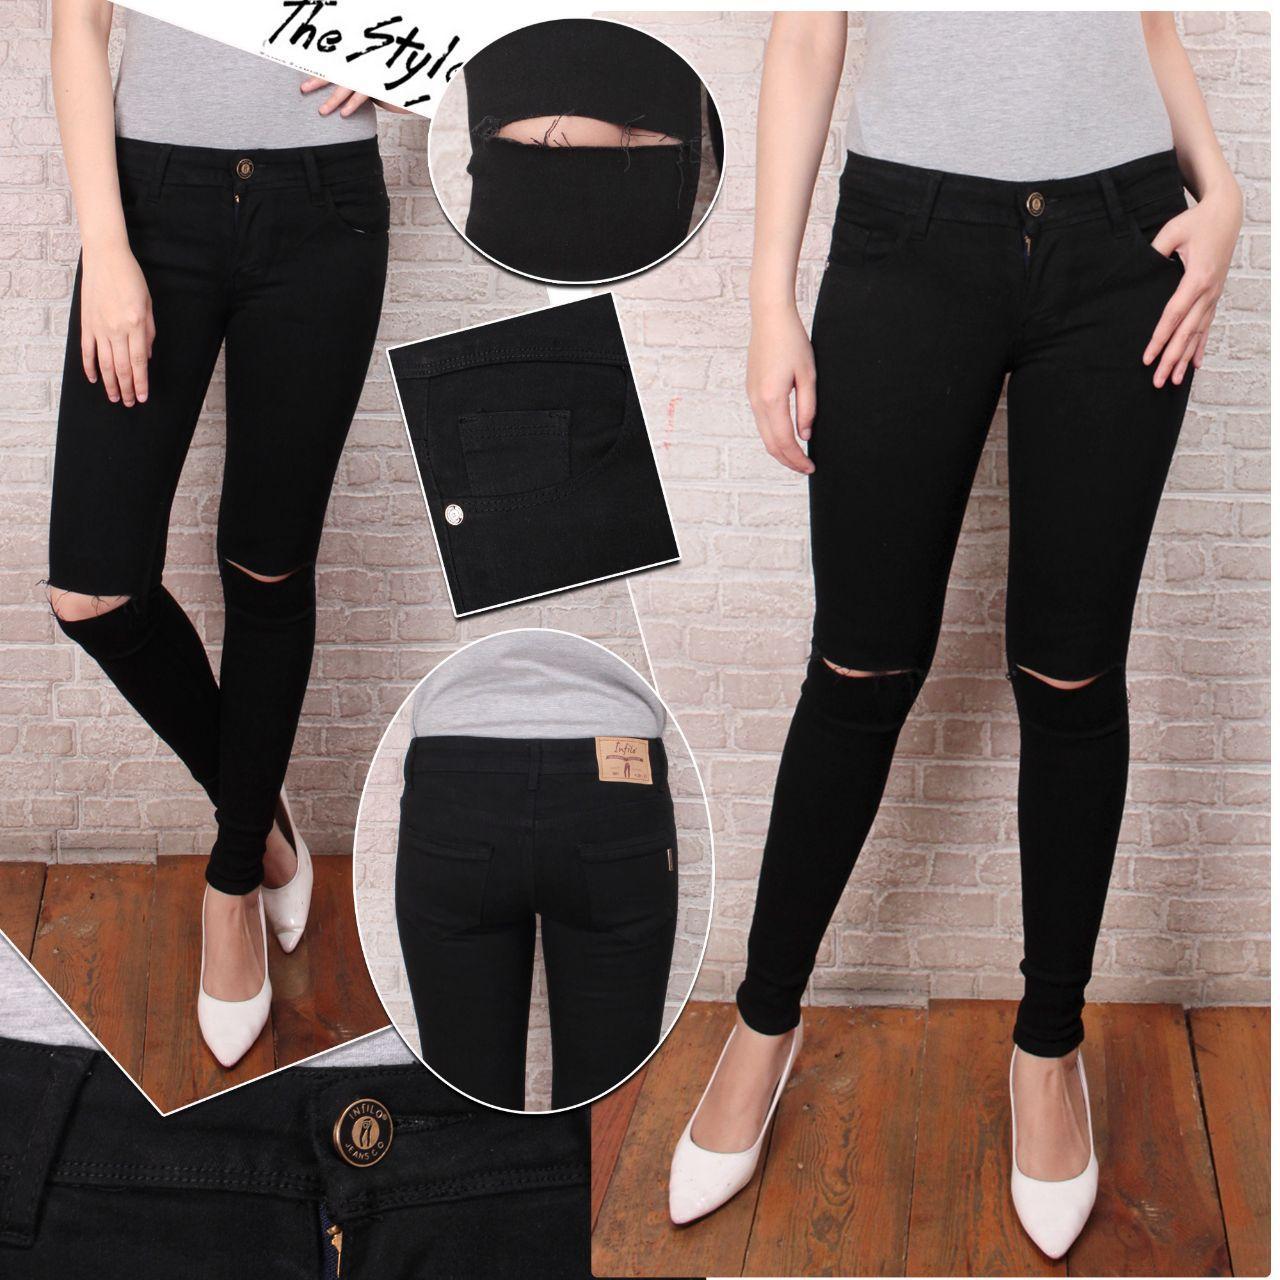 Safa Robek-24574 Jeans Robek Ripped Celana Jeans Wanita Sobek lutut Sobek Lapis Sobek Puring Skinny Street Slim Fit Trendy